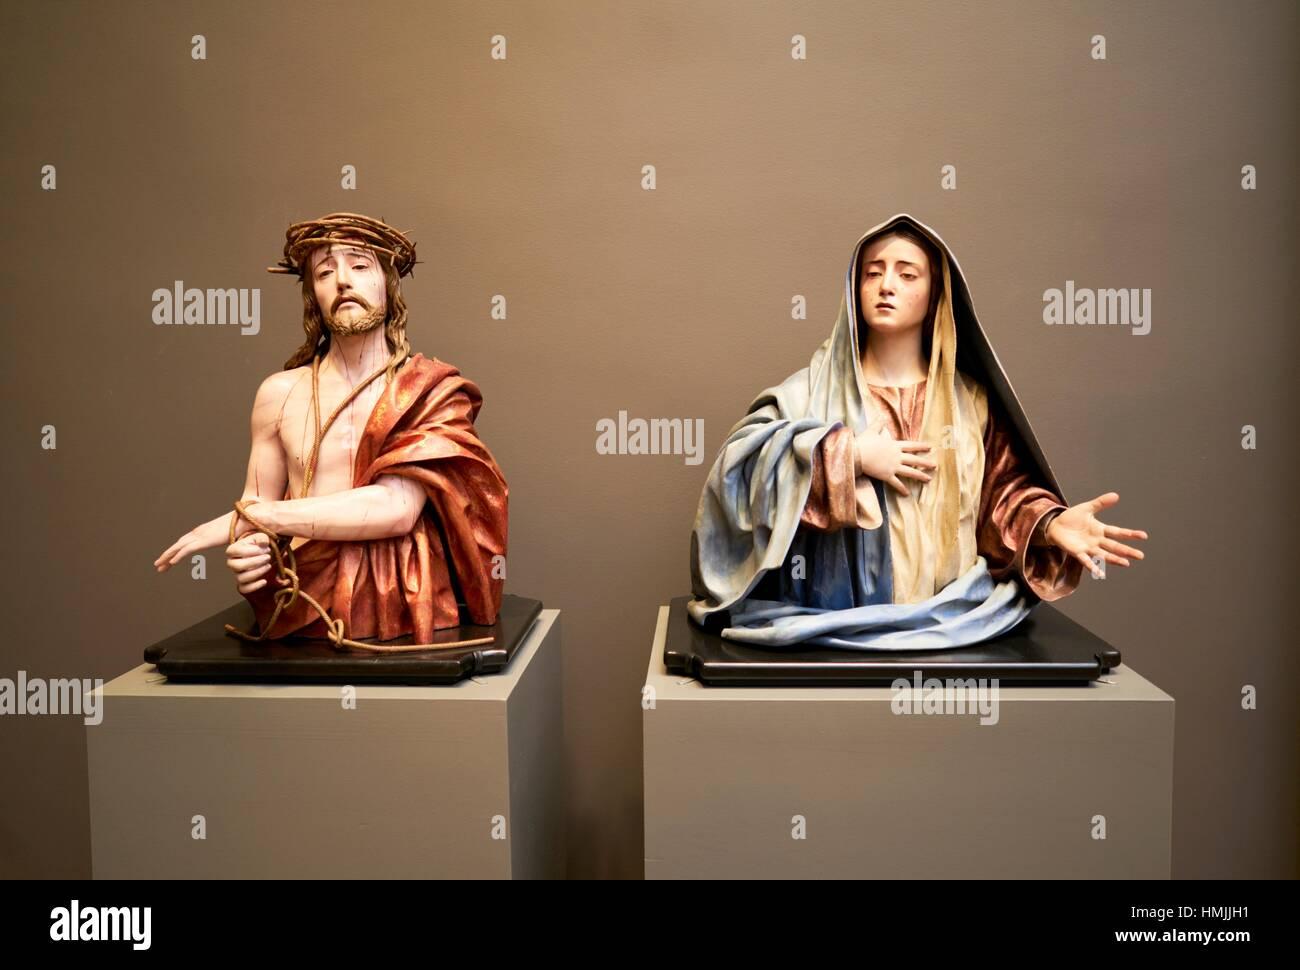 Scultura europea e arti decorative ala. Il Metropolitan Museum of Art, Manhattan, New York City, Stati Uniti d'America Immagini Stock